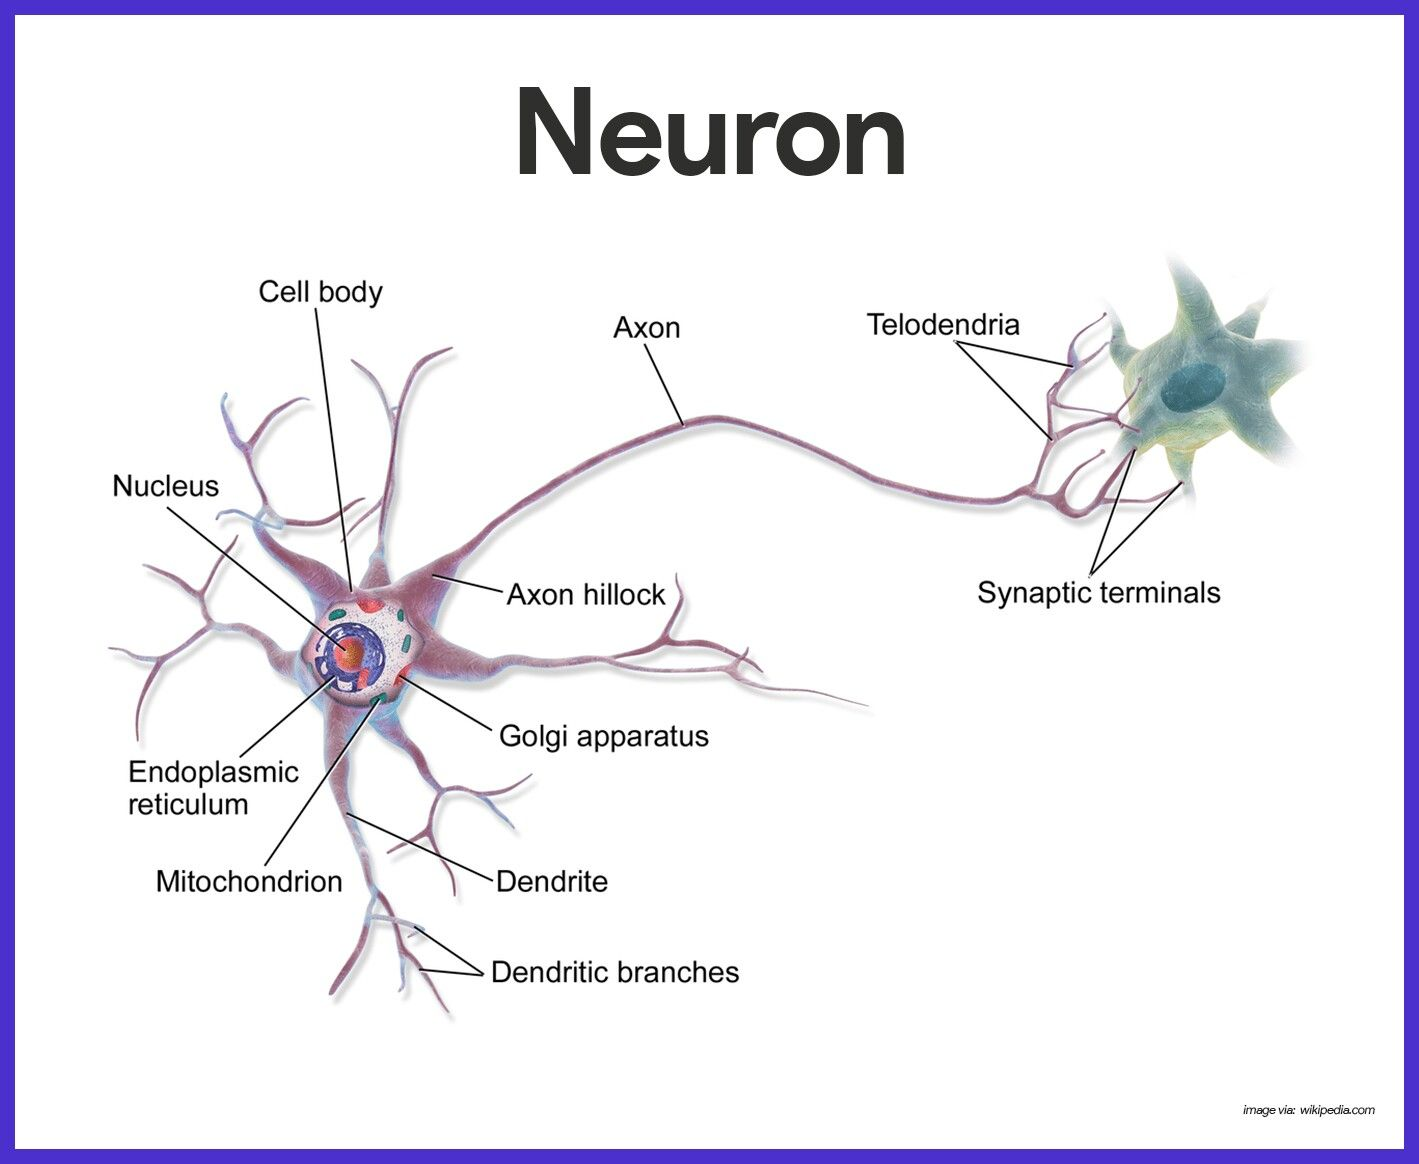 hight resolution of blausen 0657 multipolarneuron multipolar neuron wikipedia the free encyclopedia neurons autonomic nervous system